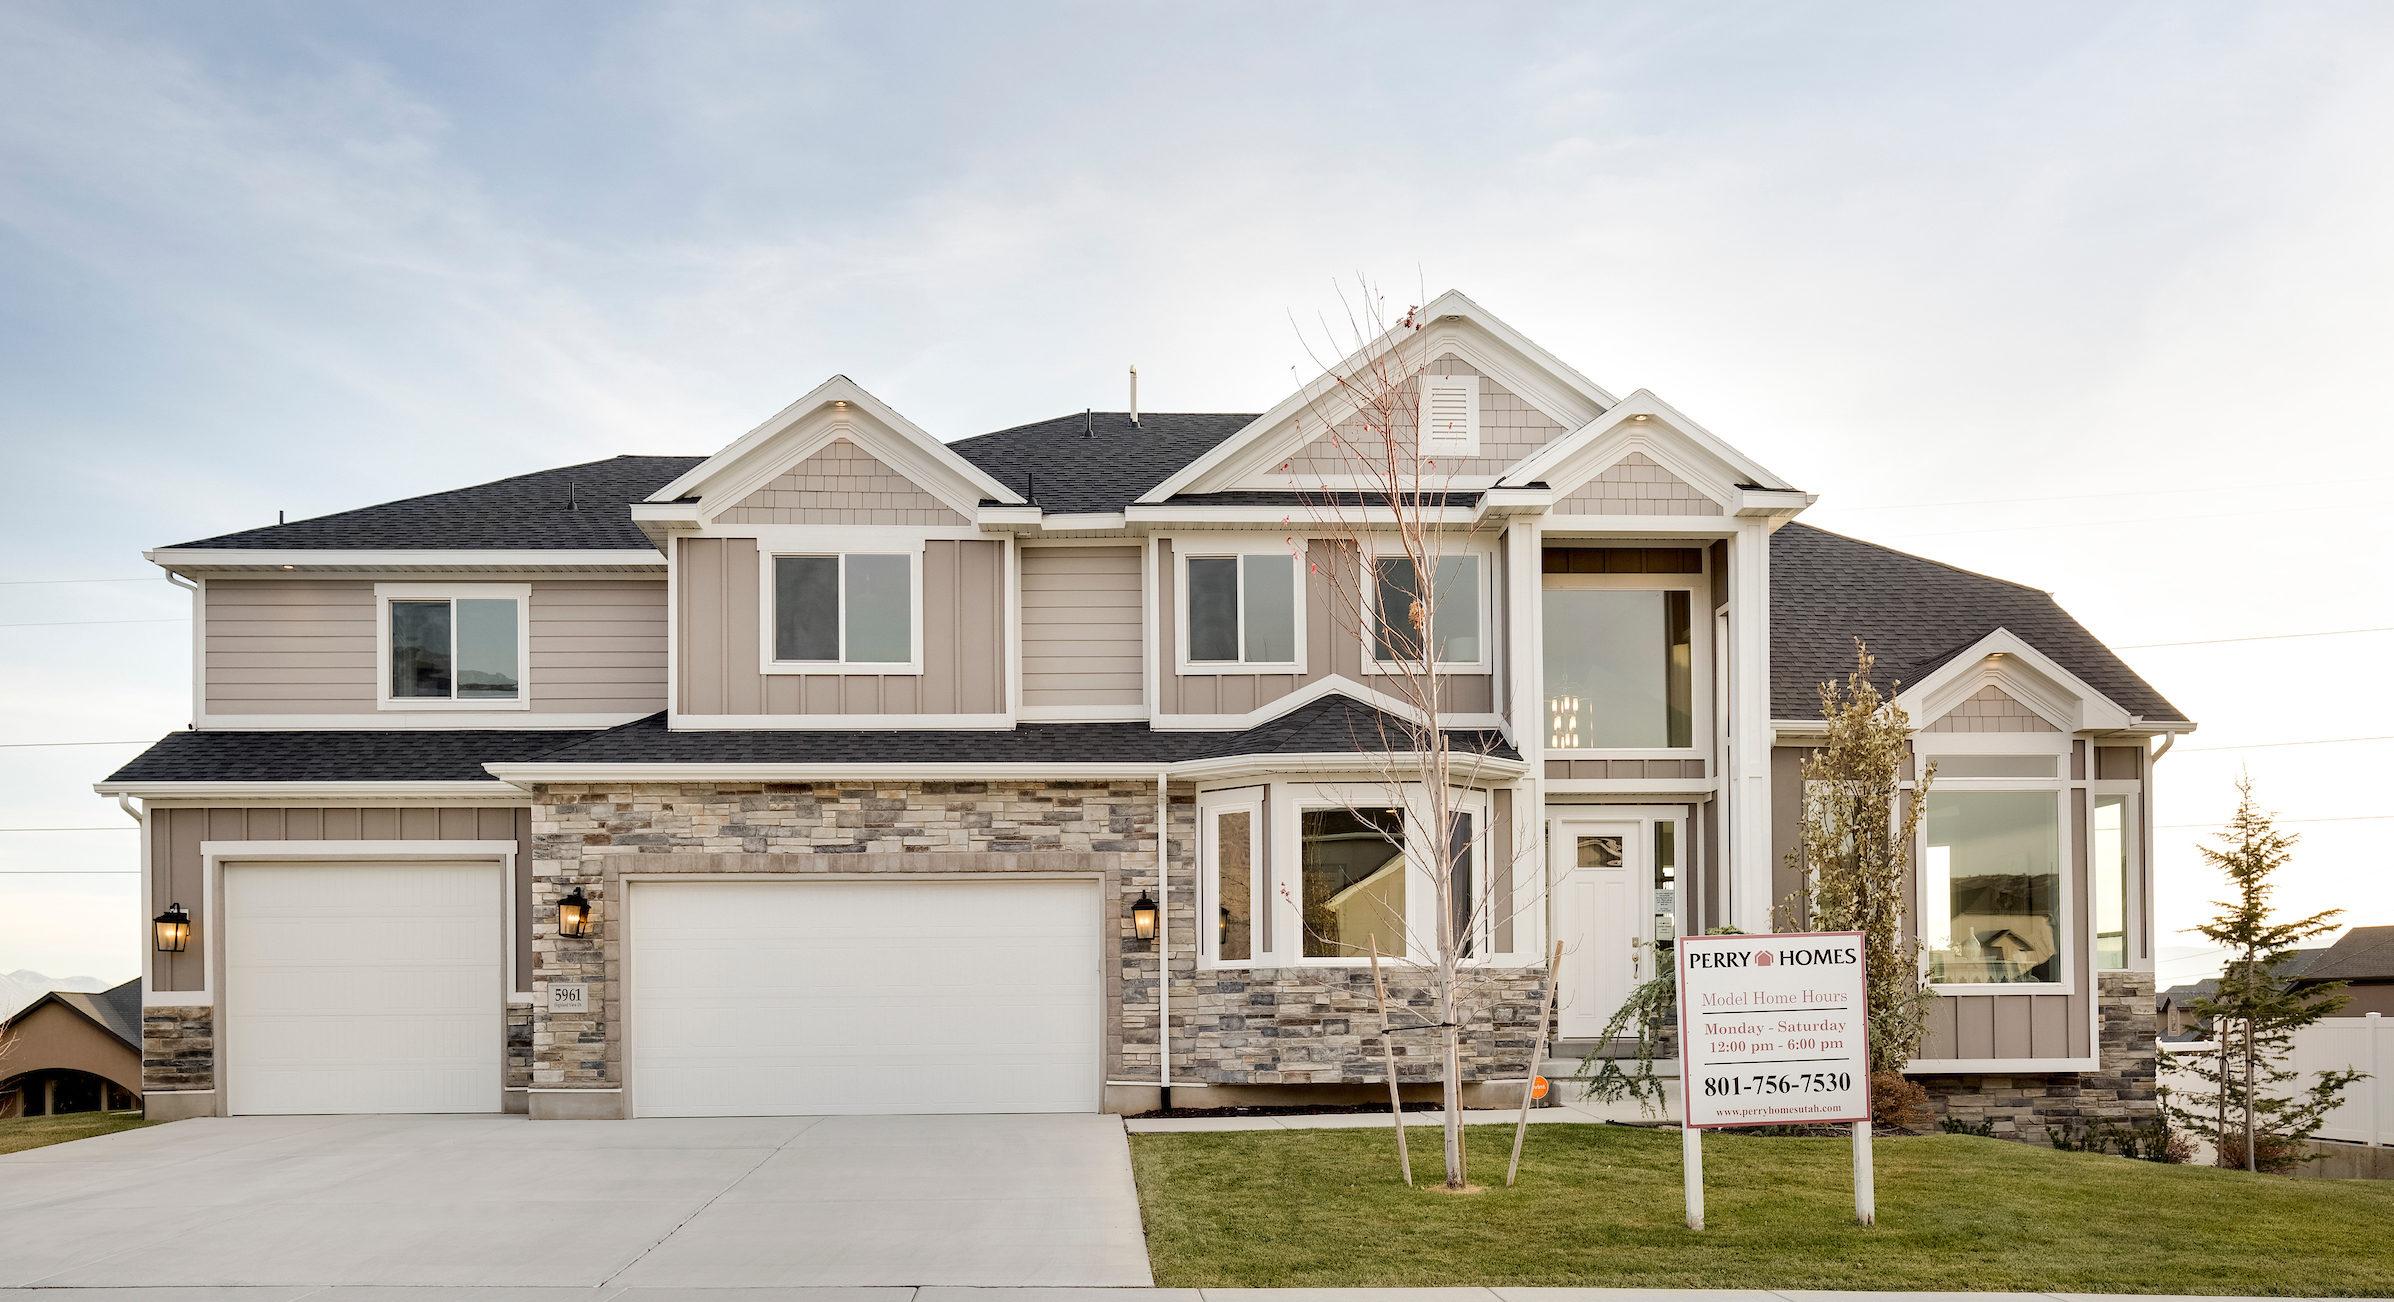 Beacon Hill Model Home